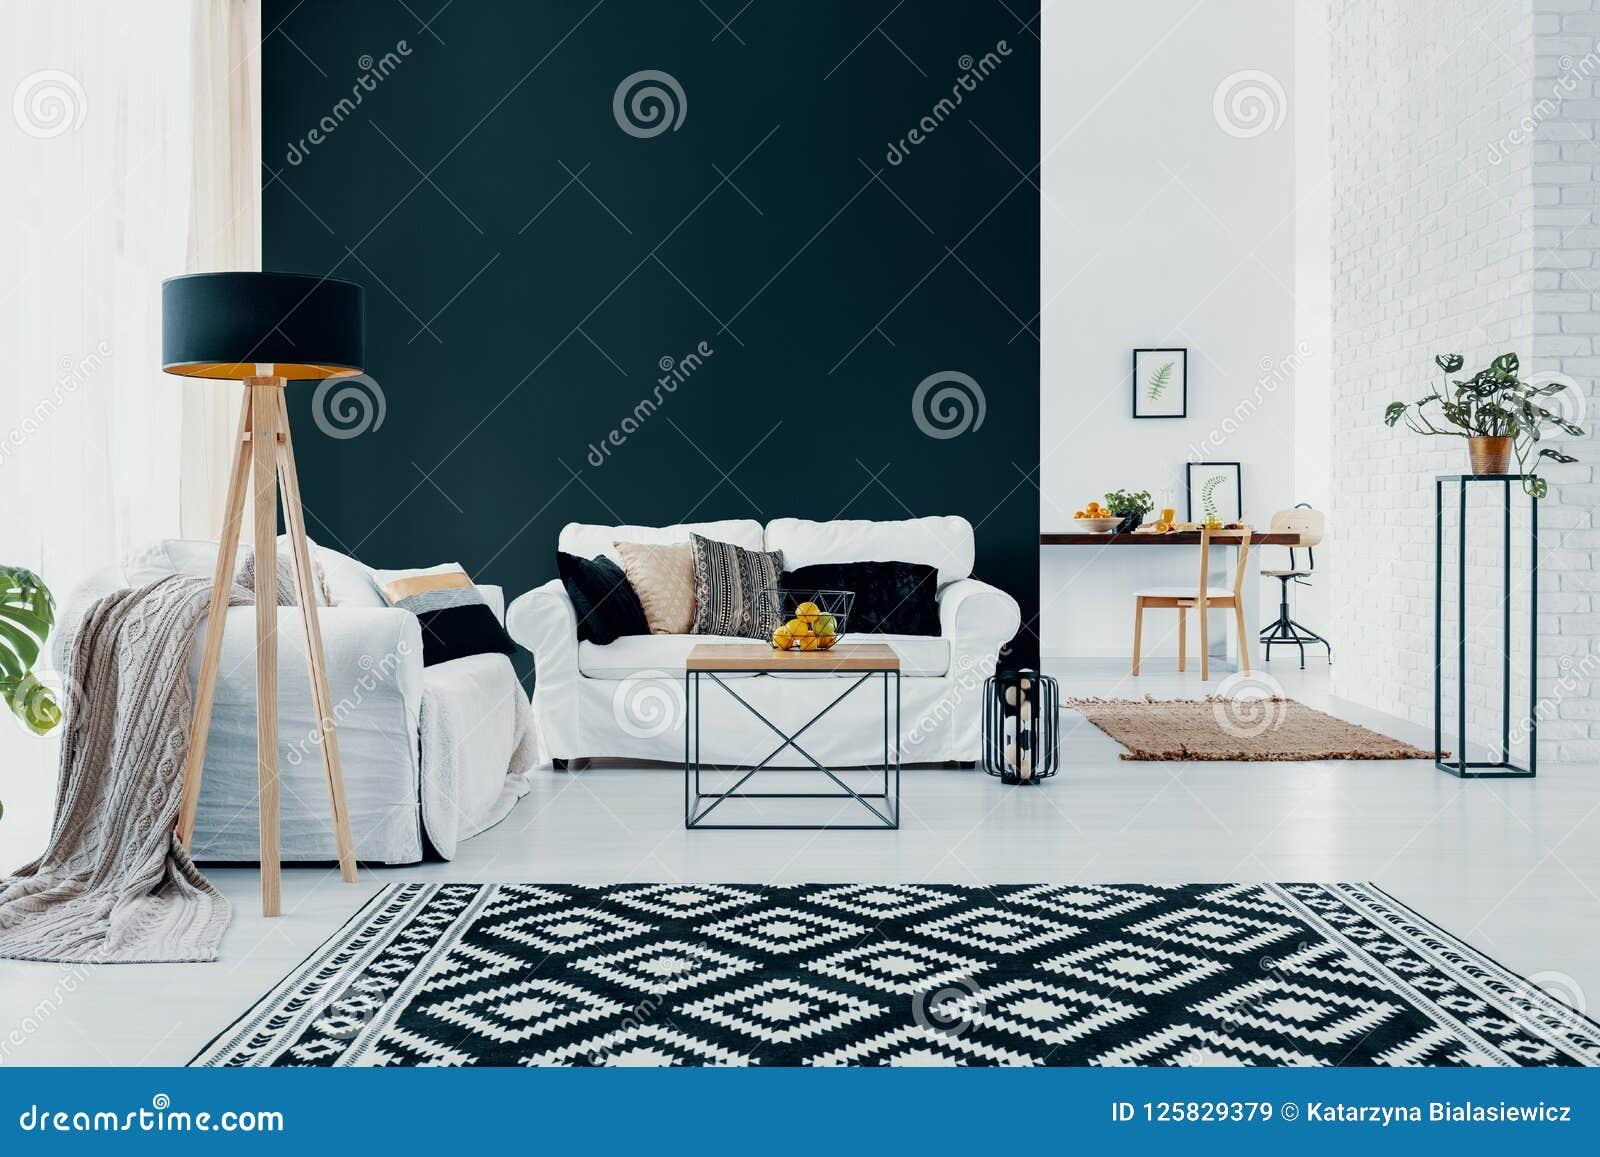 Witte laag tegen zwarte muur in modern woonkamerbinnenland met gevormd tapijt Echte foto